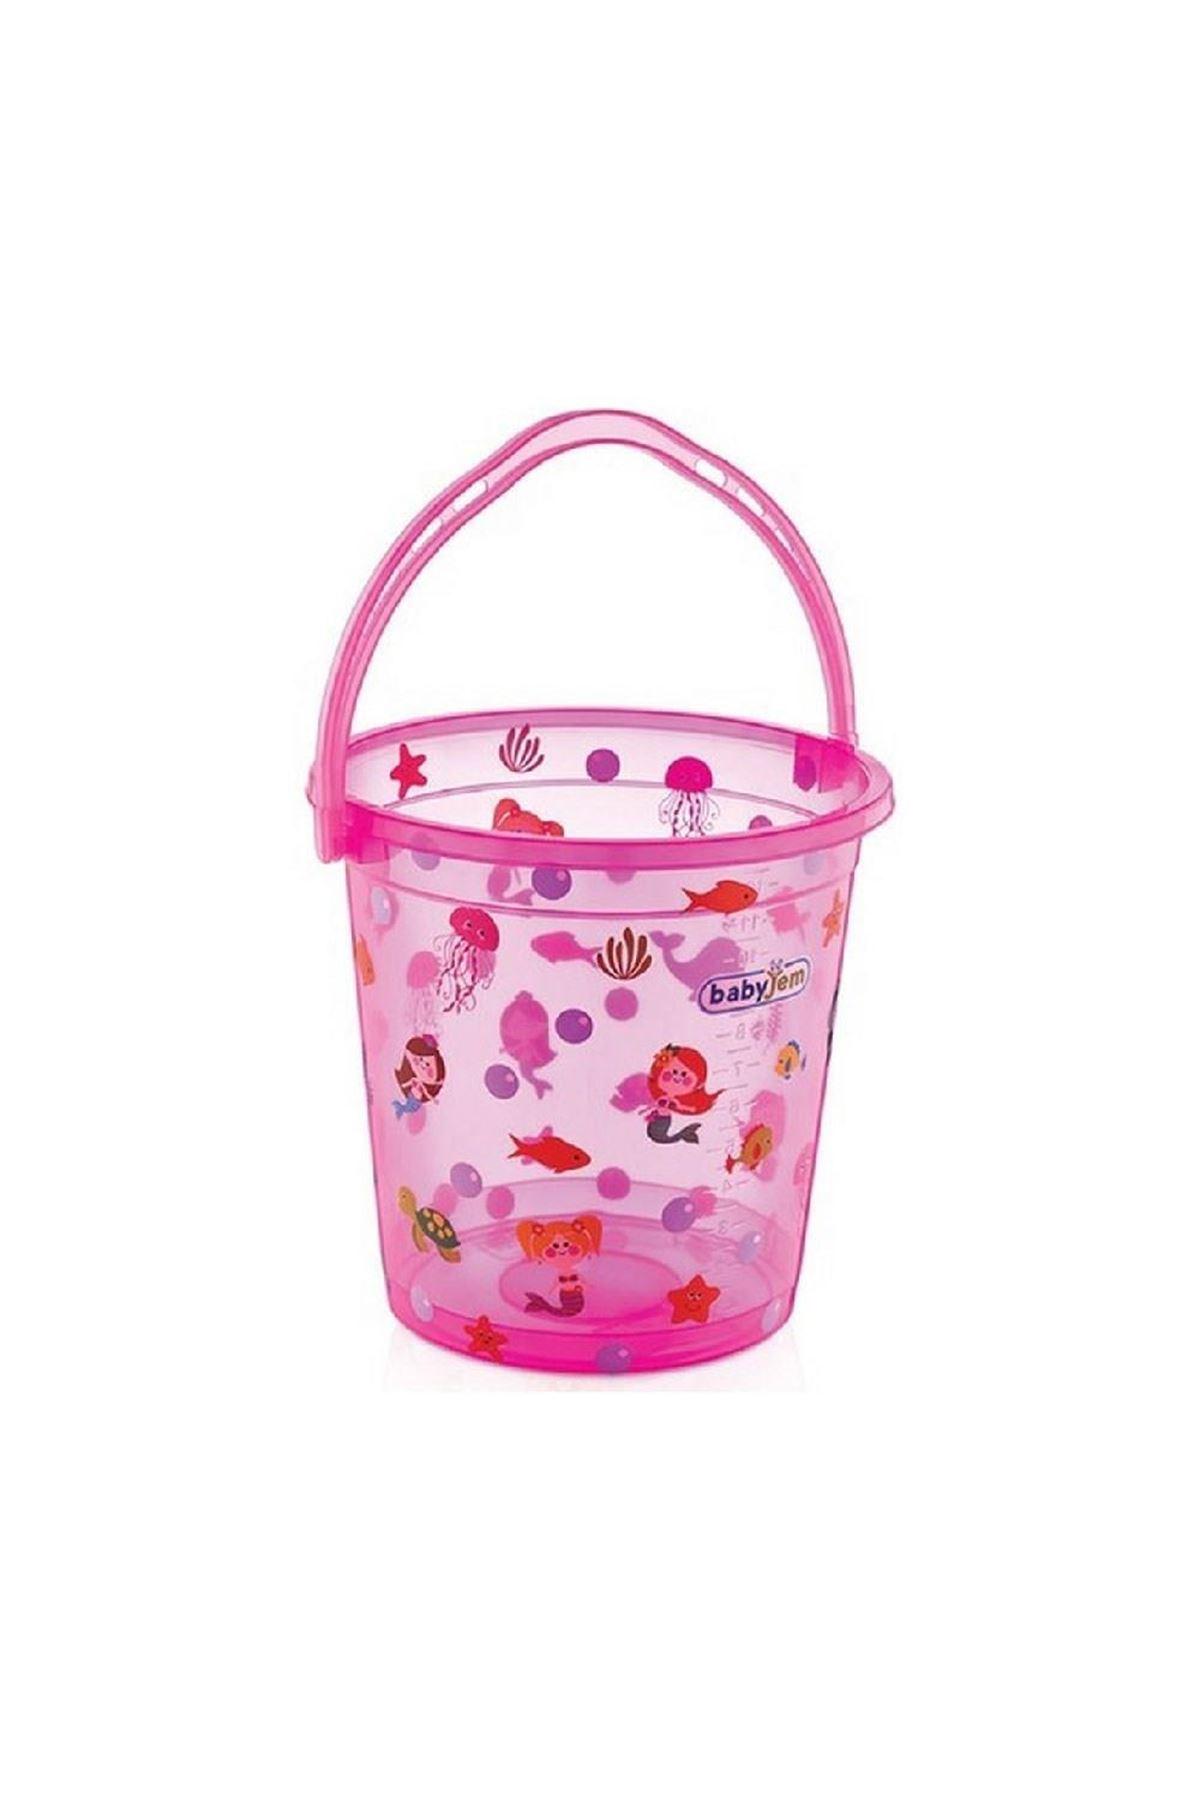 BabyJem Bebek Banyo Kovası Şeffaf Desenli 399 Pembe